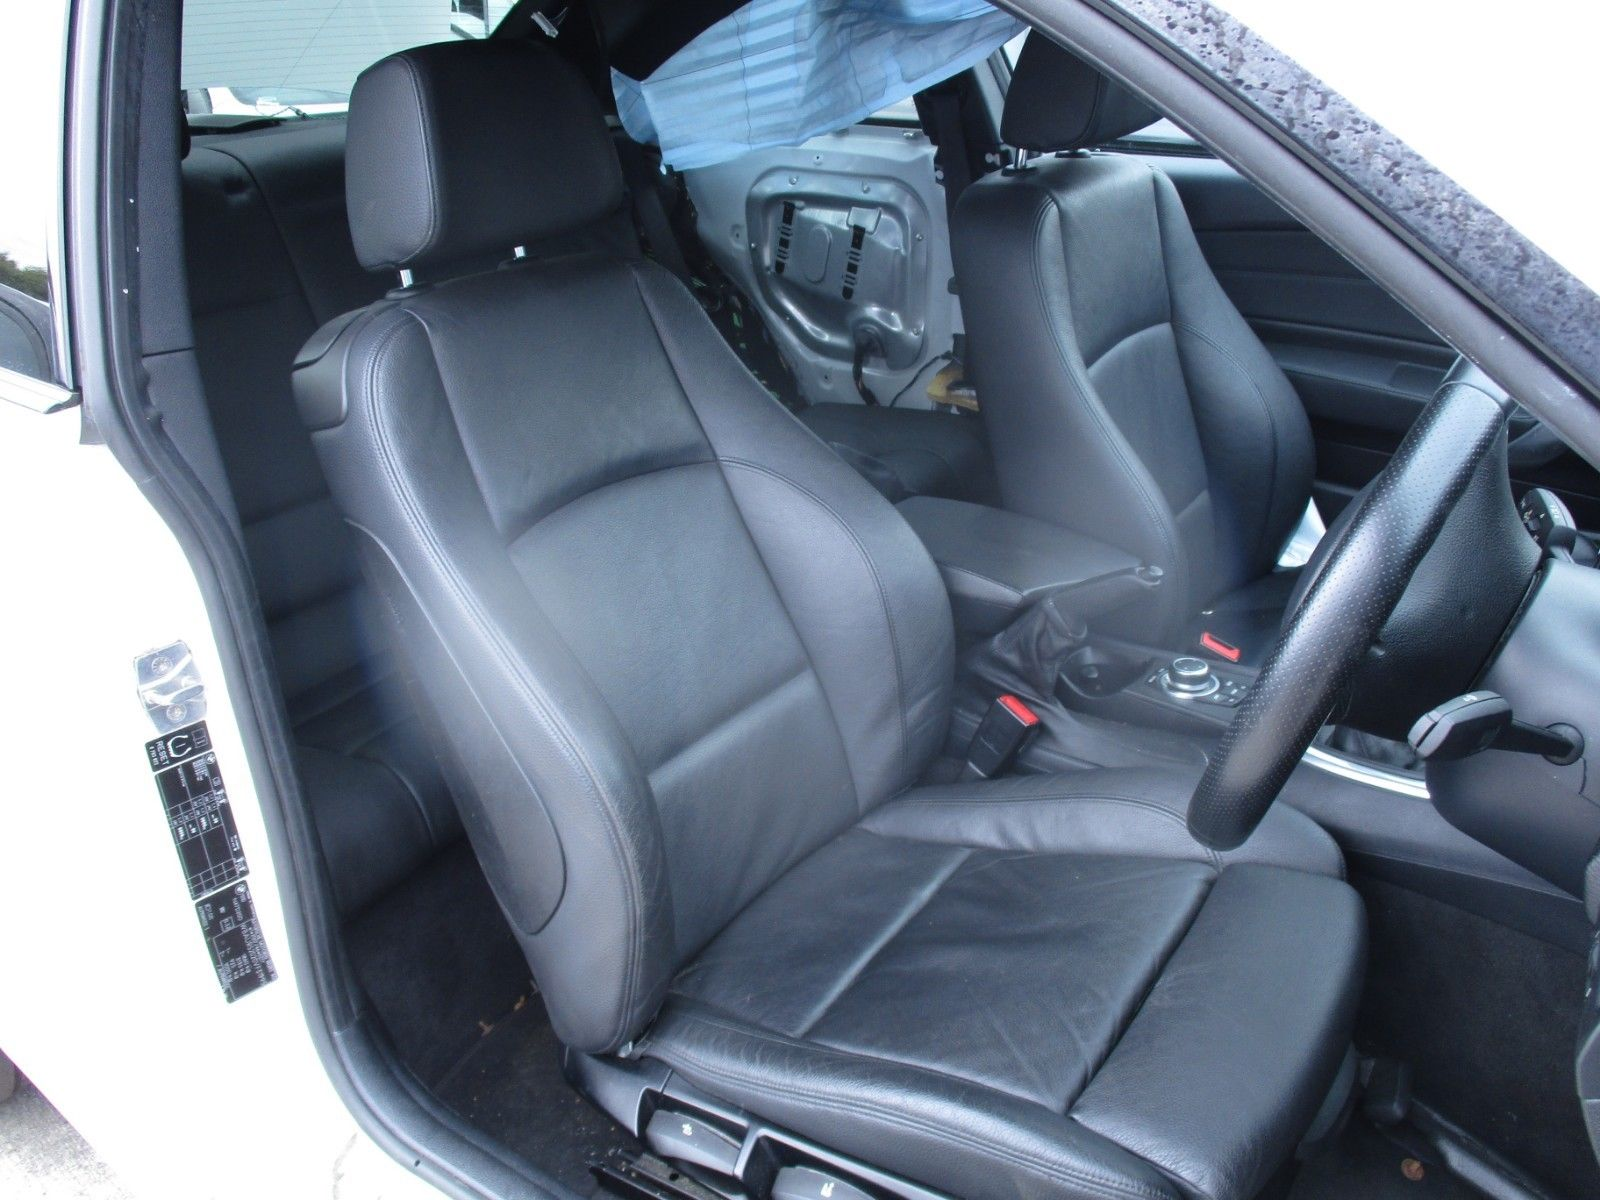 2010 Bmw 1 Series M Sport E82 Complete Black Leather Interior Birnam Motor Salvage